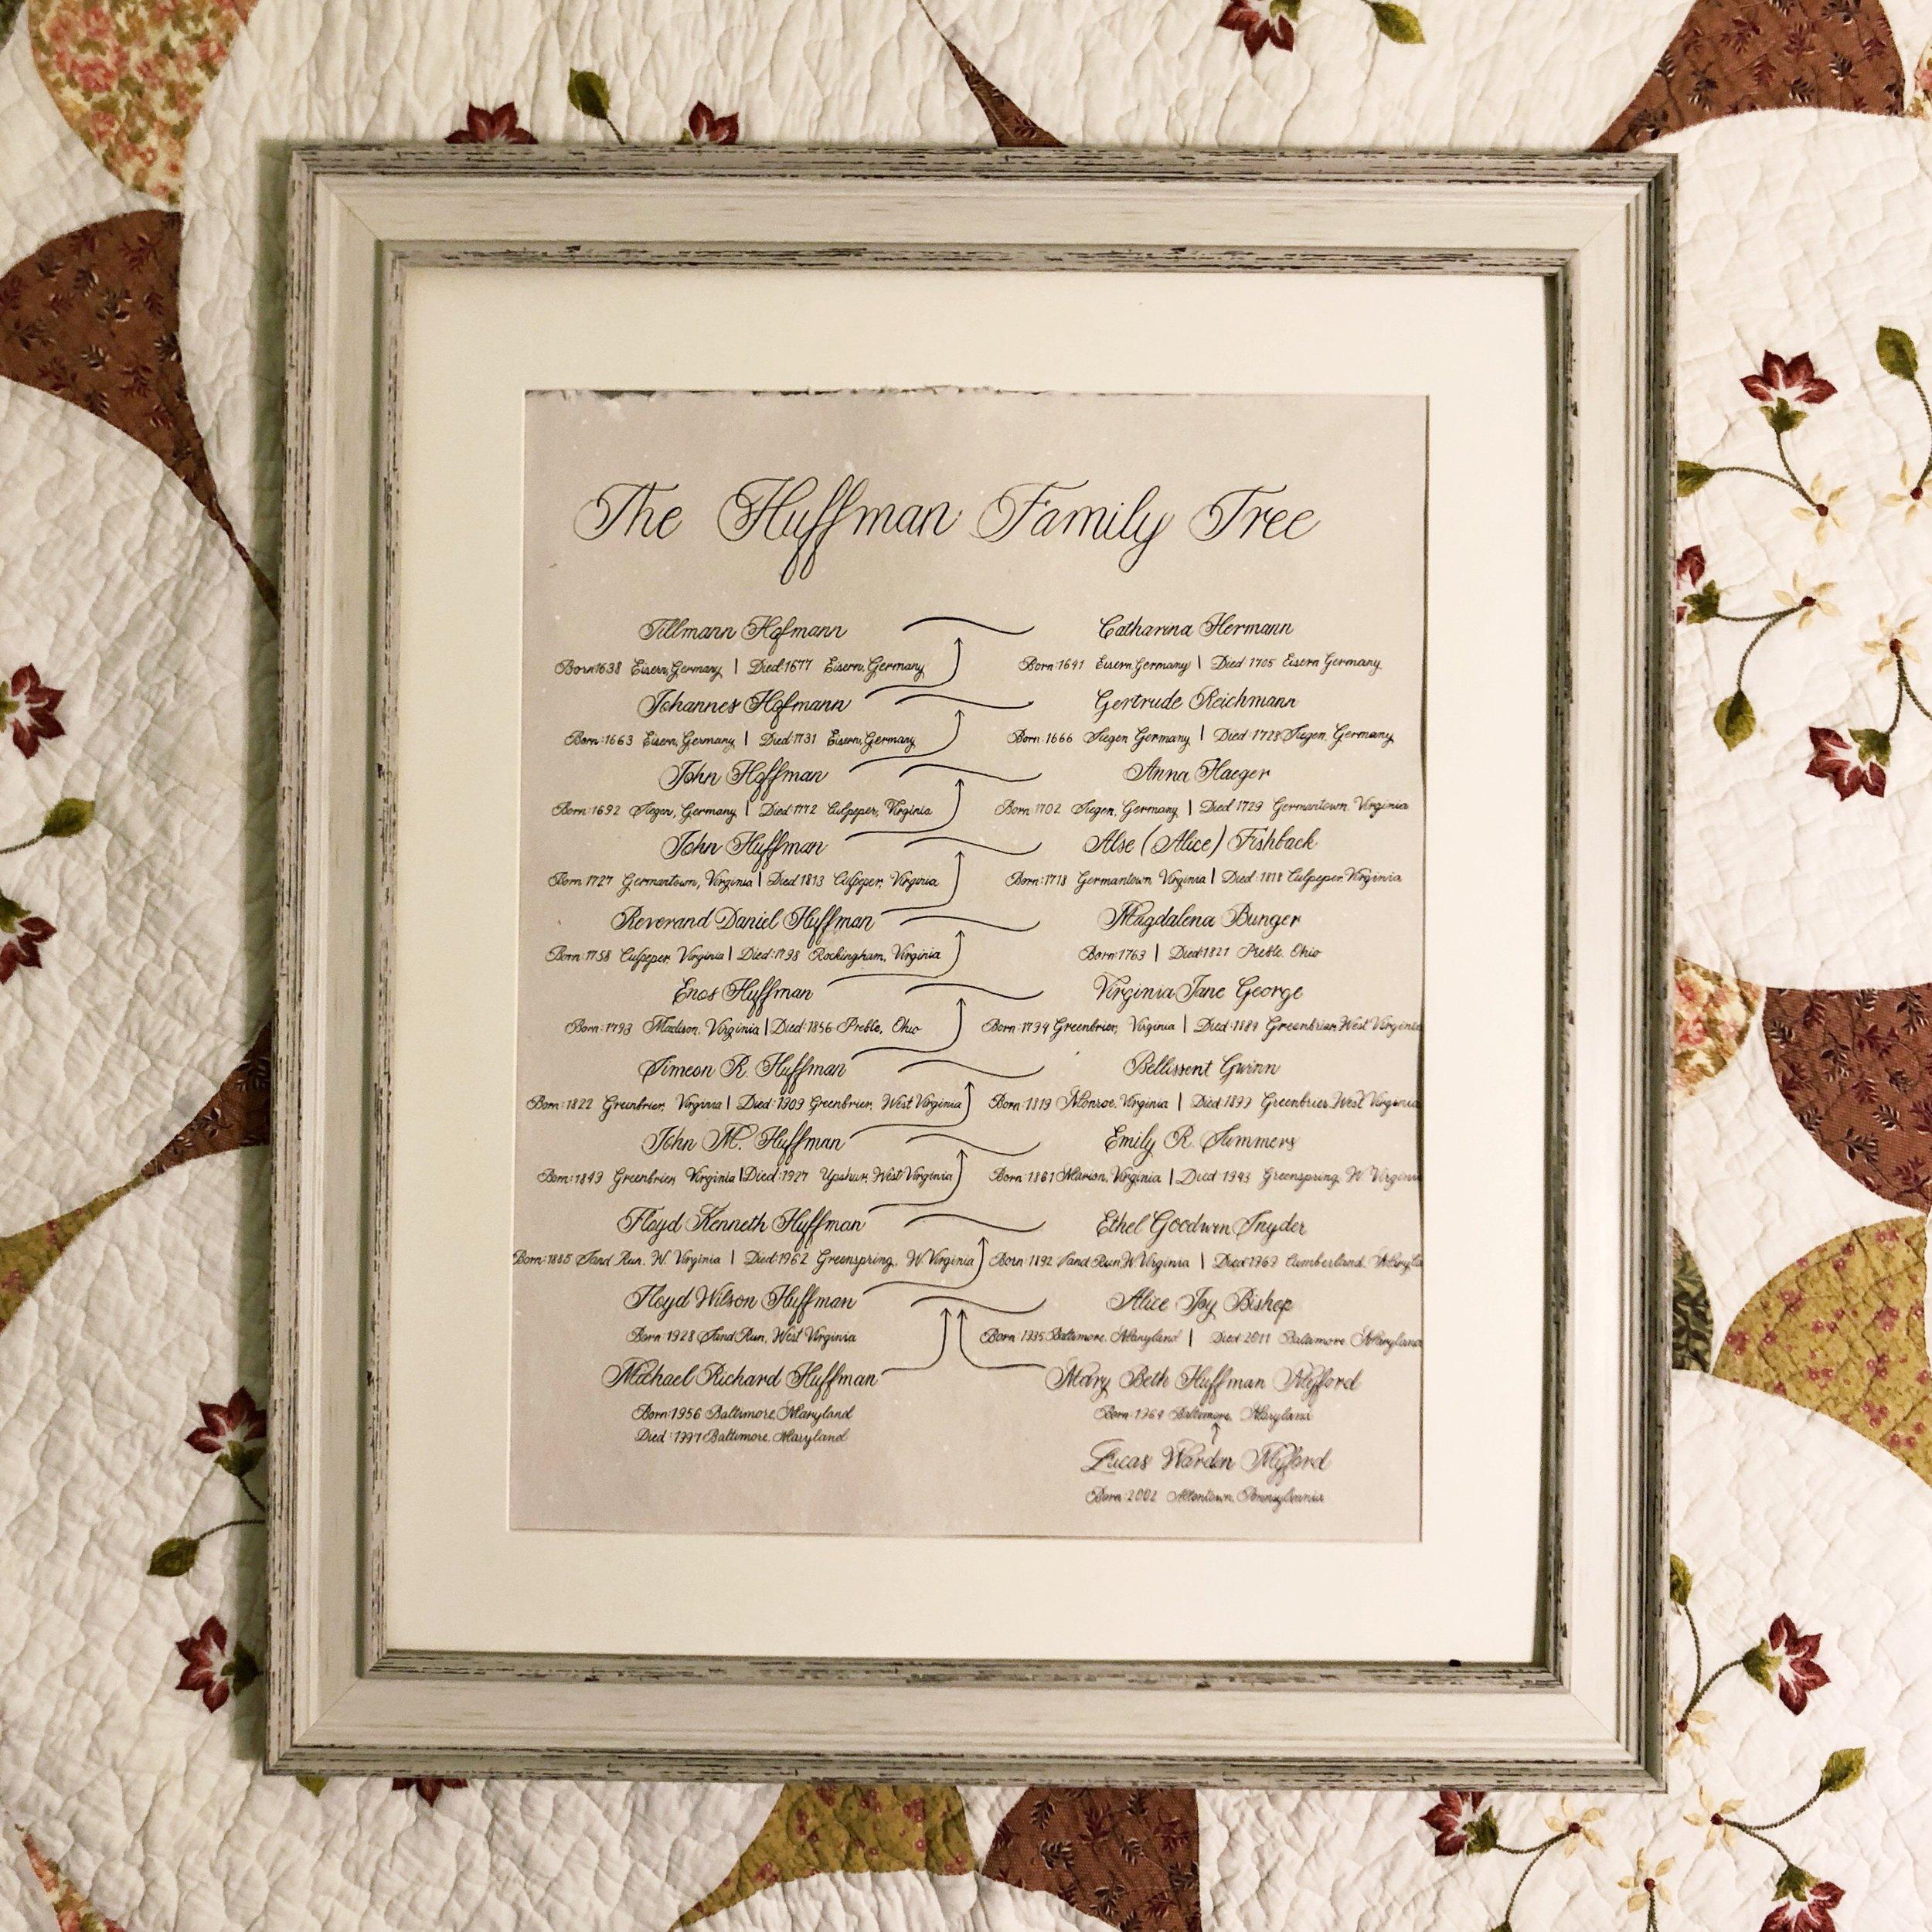 Central PA, York PA, JesSmith Designs, custom, wedding, invitations, bridal, announcements, save the date, baby, hanover, calligraphy, baltimore, wedding invitations, lancaster, gettysburg-03-28 21.56.06.jpg